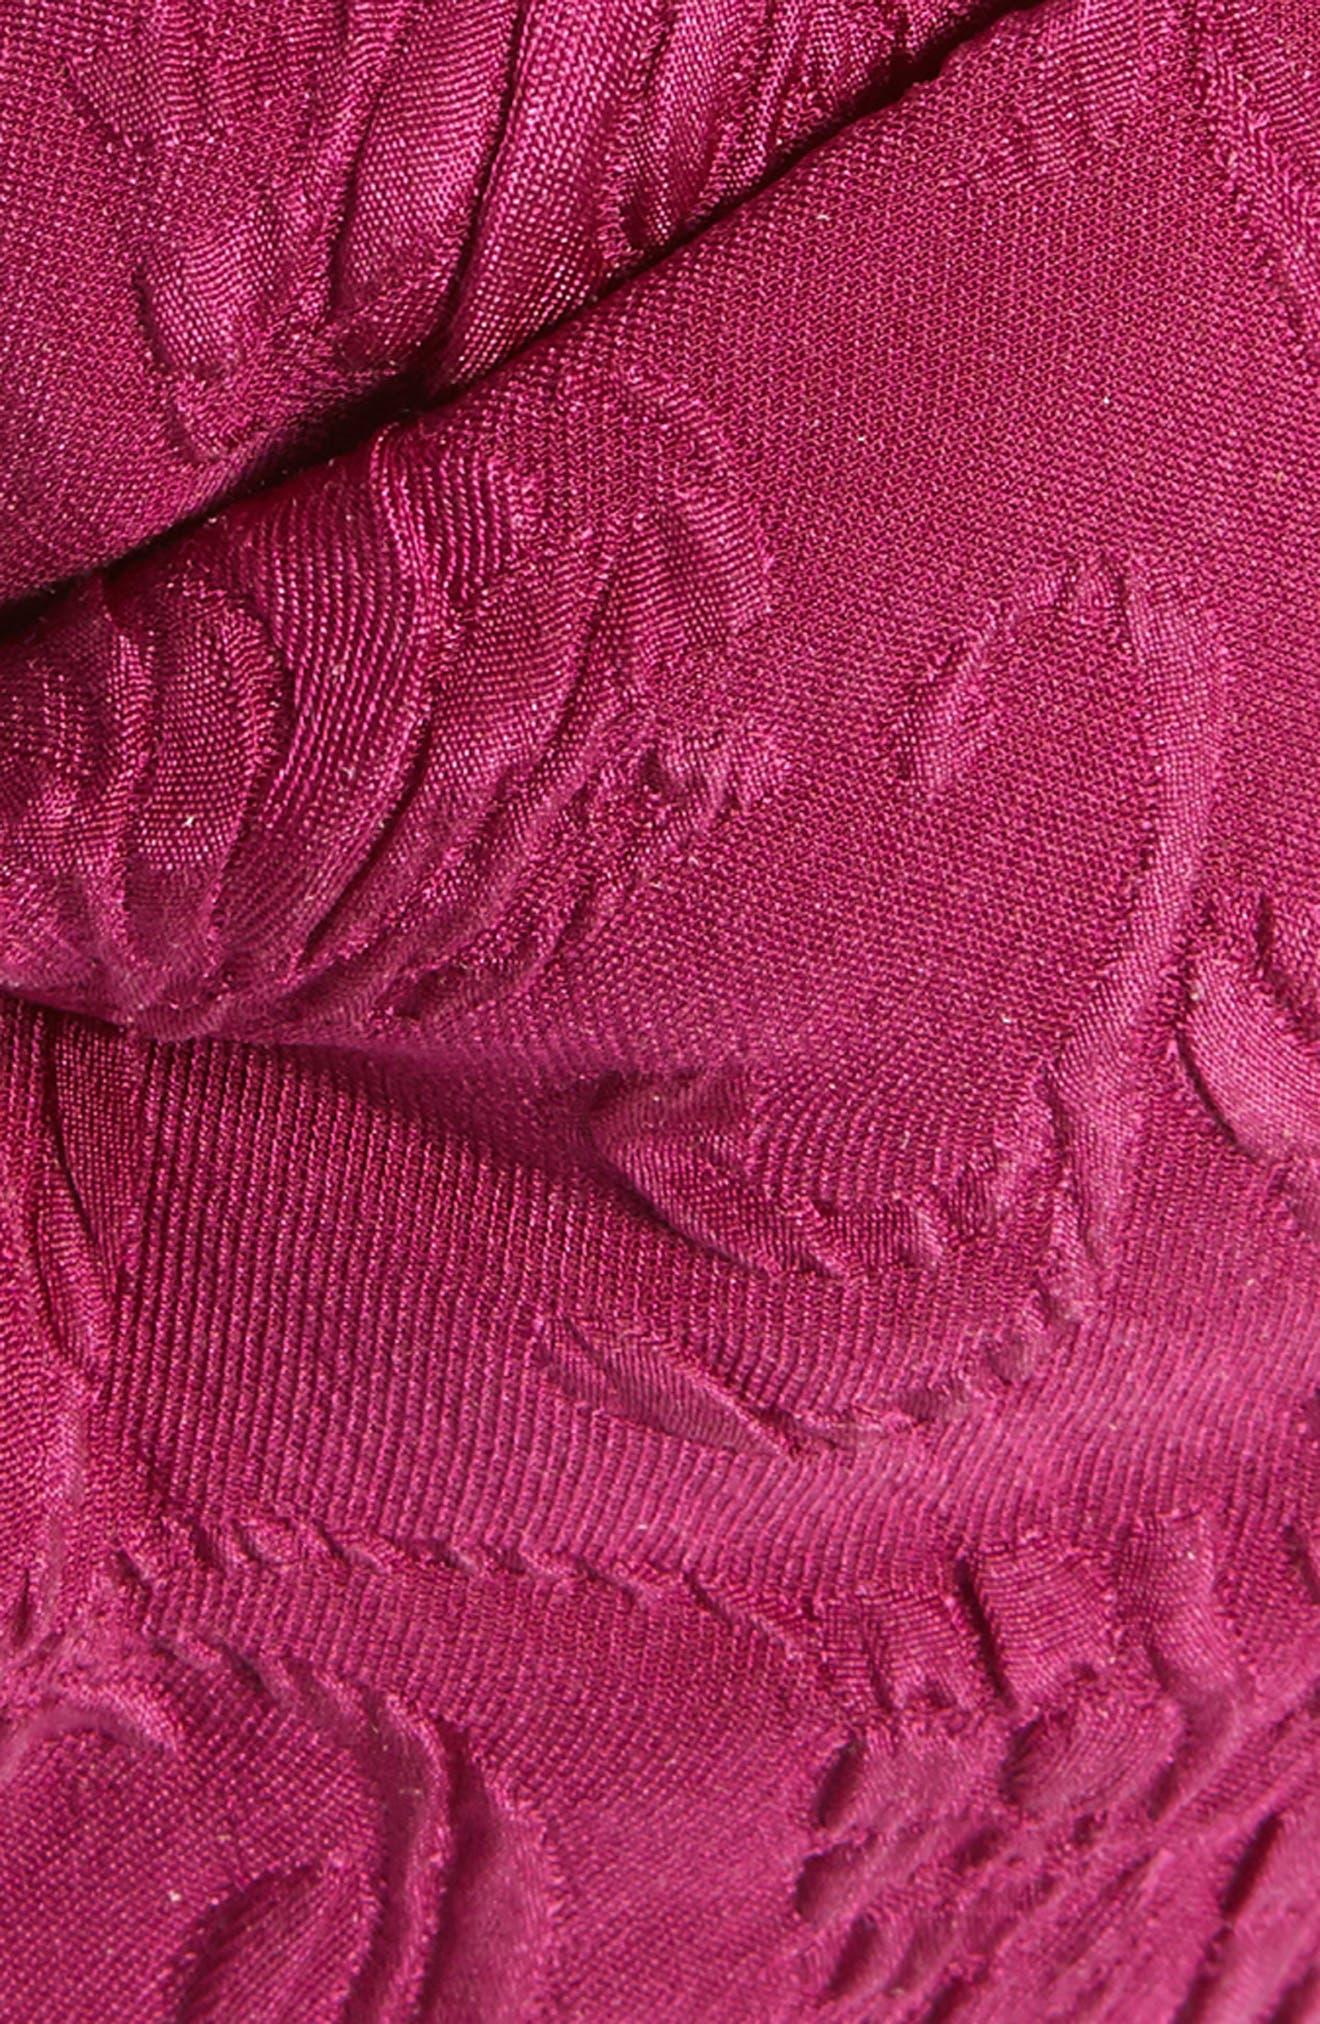 Rilly Brocade Silk Turban,                             Alternate thumbnail 2, color,                             MAUVE